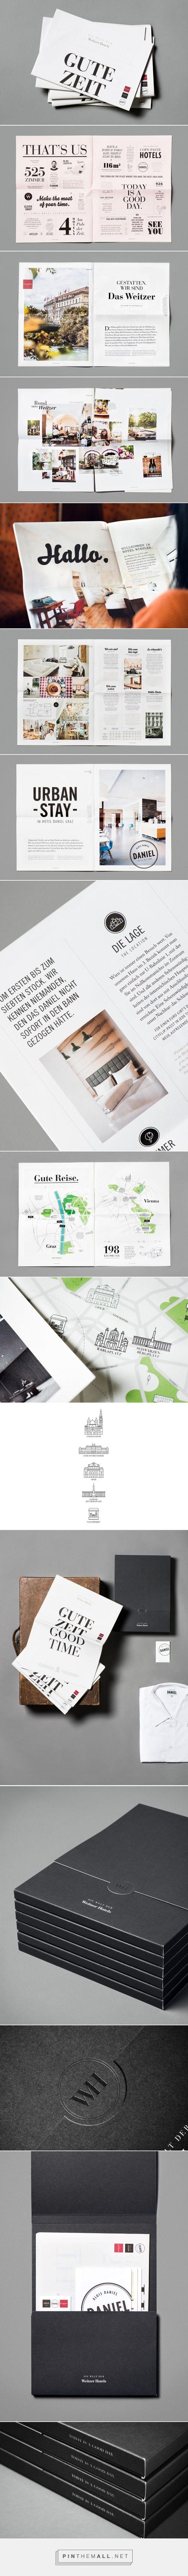 moodley brand identity (2015): Die Welt der Weitzer Hotels, via moodley.at